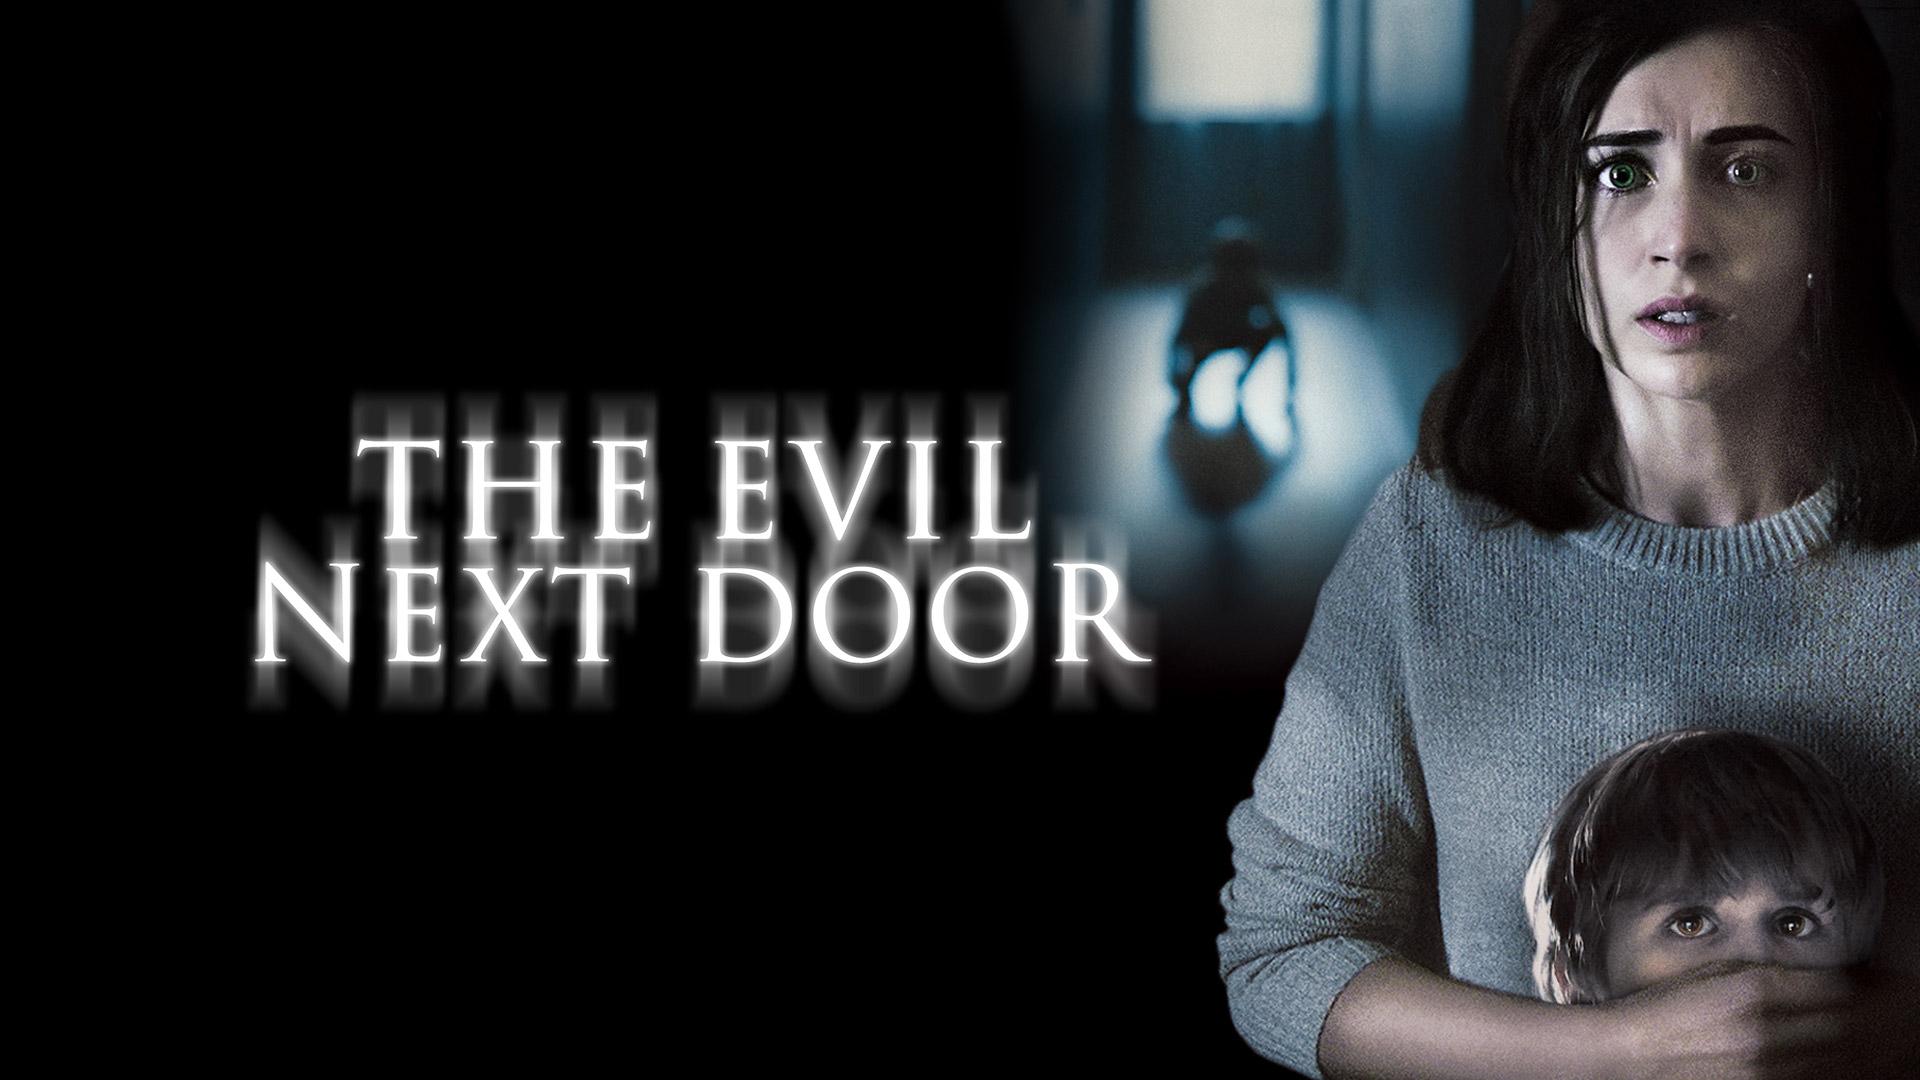 The Evil Next Door (English dub)